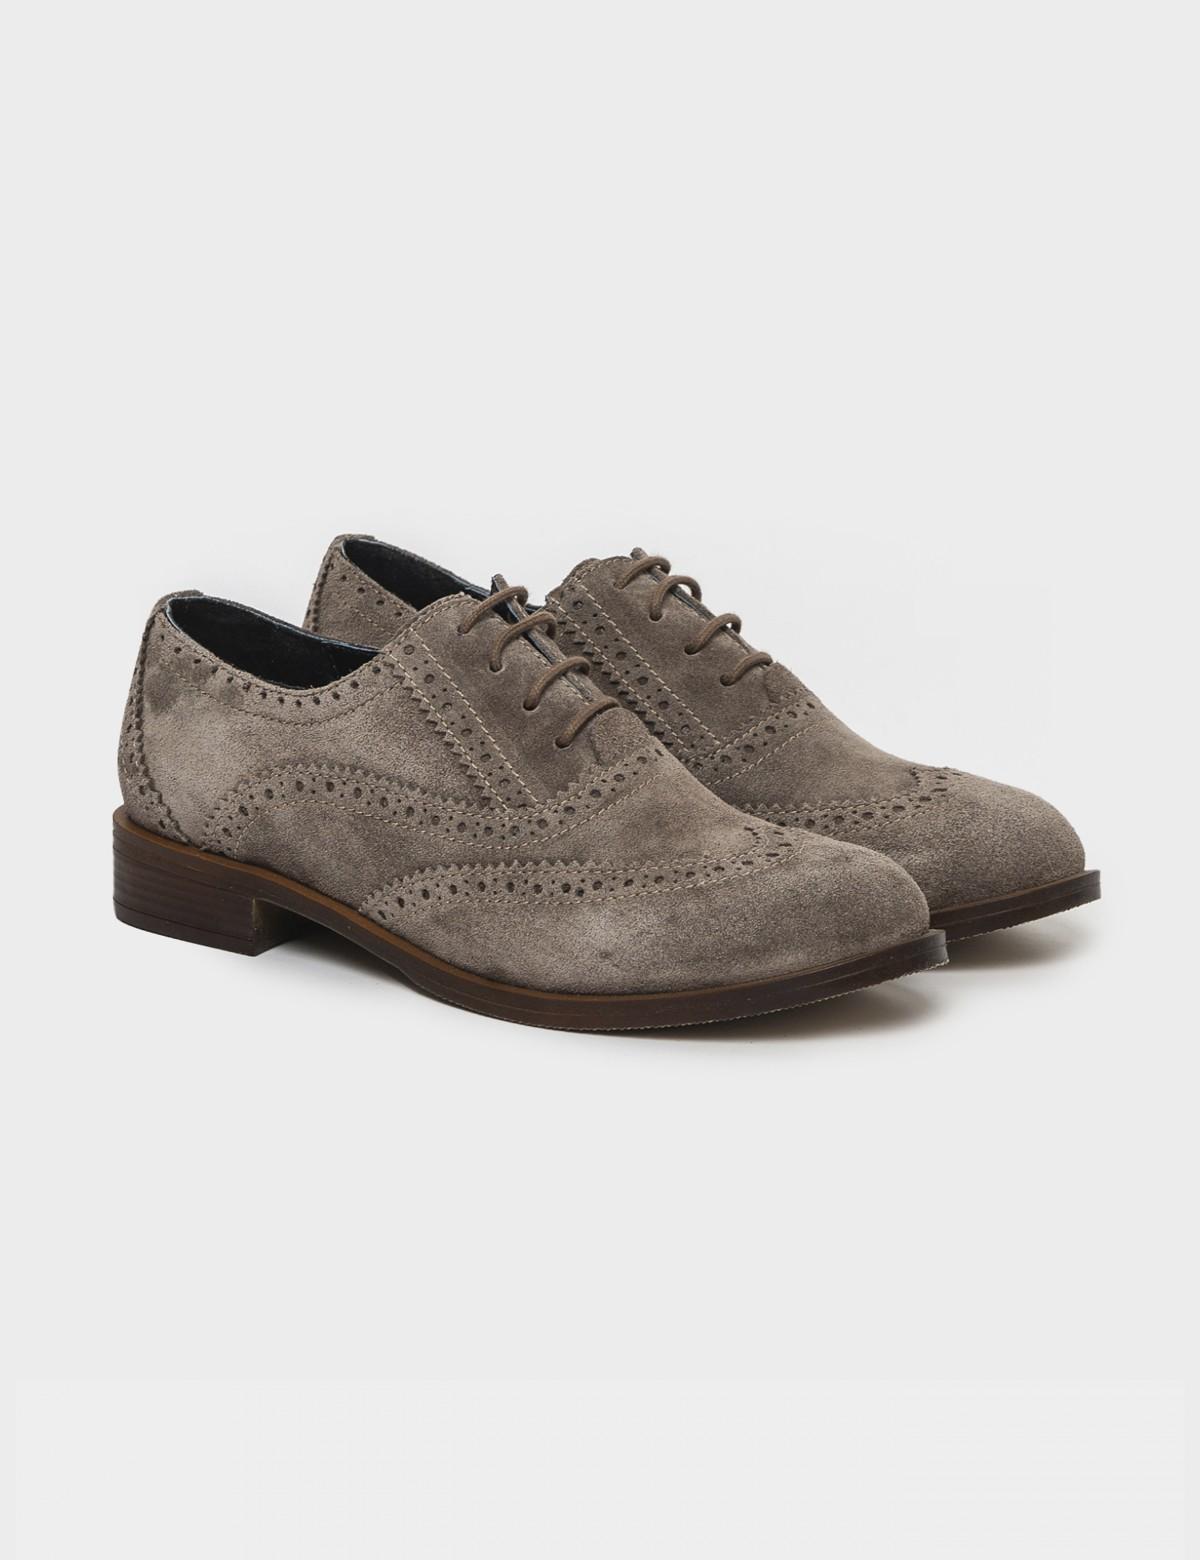 Туфли бежевые. Натуральная замша1